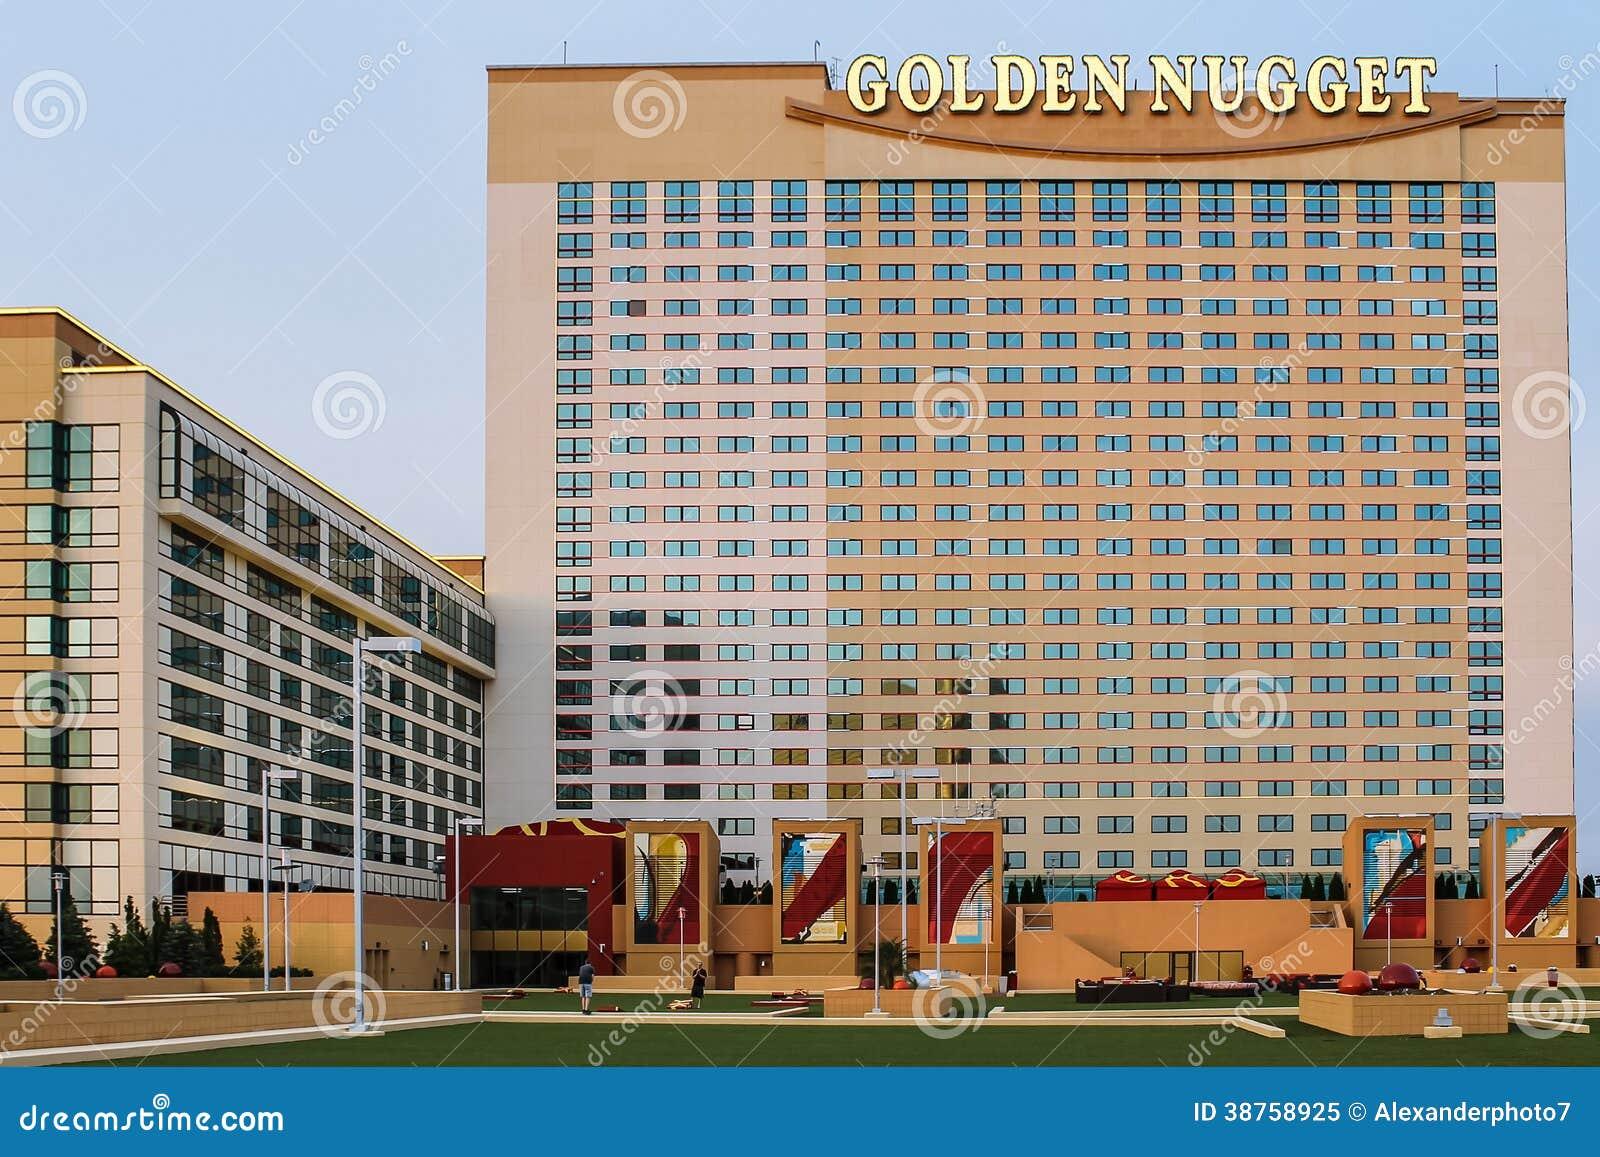 Golden Nugget Casino New Jersey